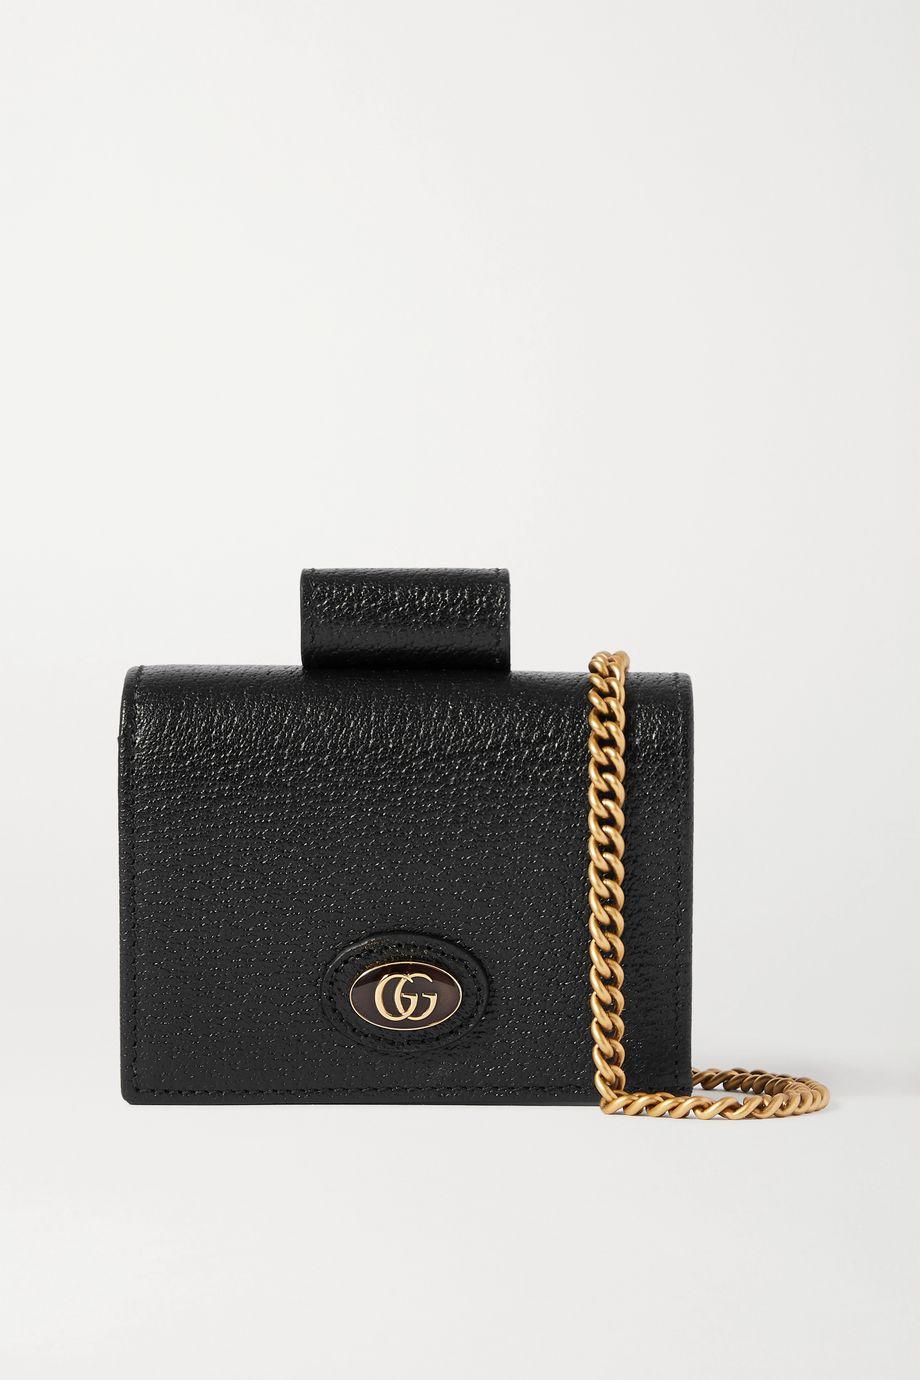 Gucci Porte Rouges embellished textured-leather wallet